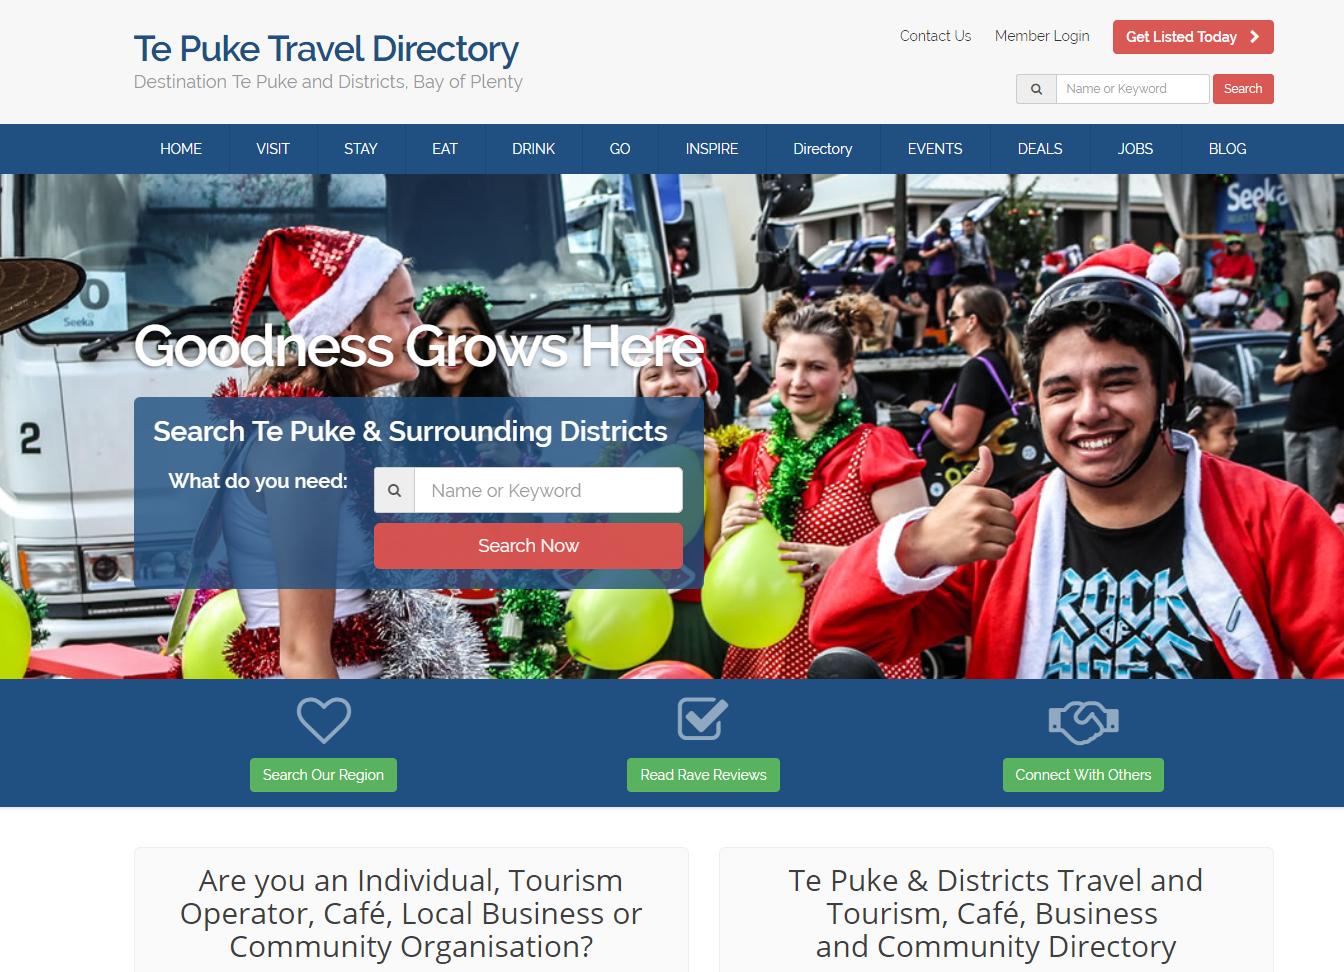 Te Puke travel and tourism directory